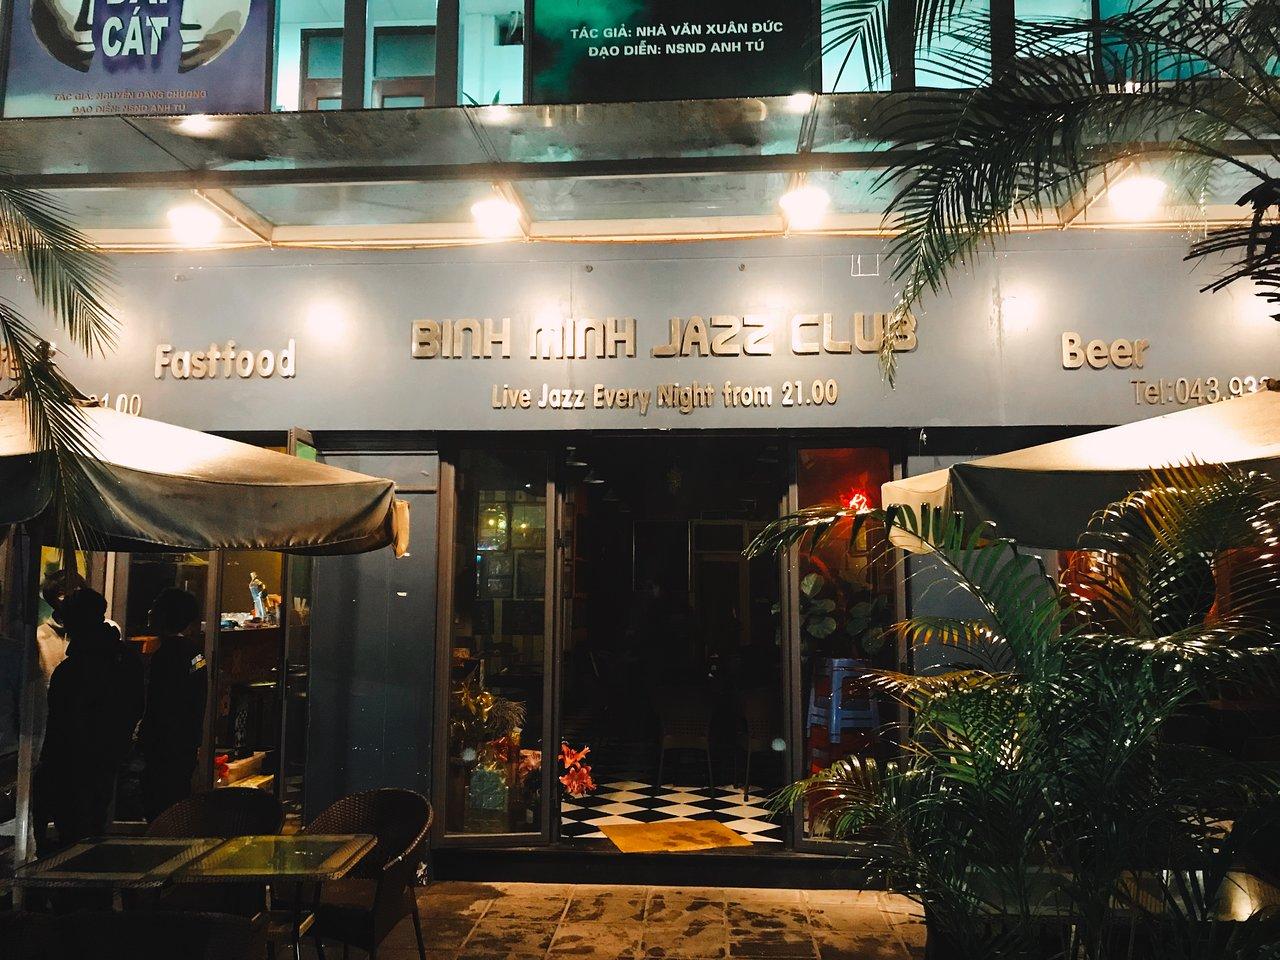 Top Nightlife Place To Have Fun in Hanoi-Binh Minh's Jazz Club